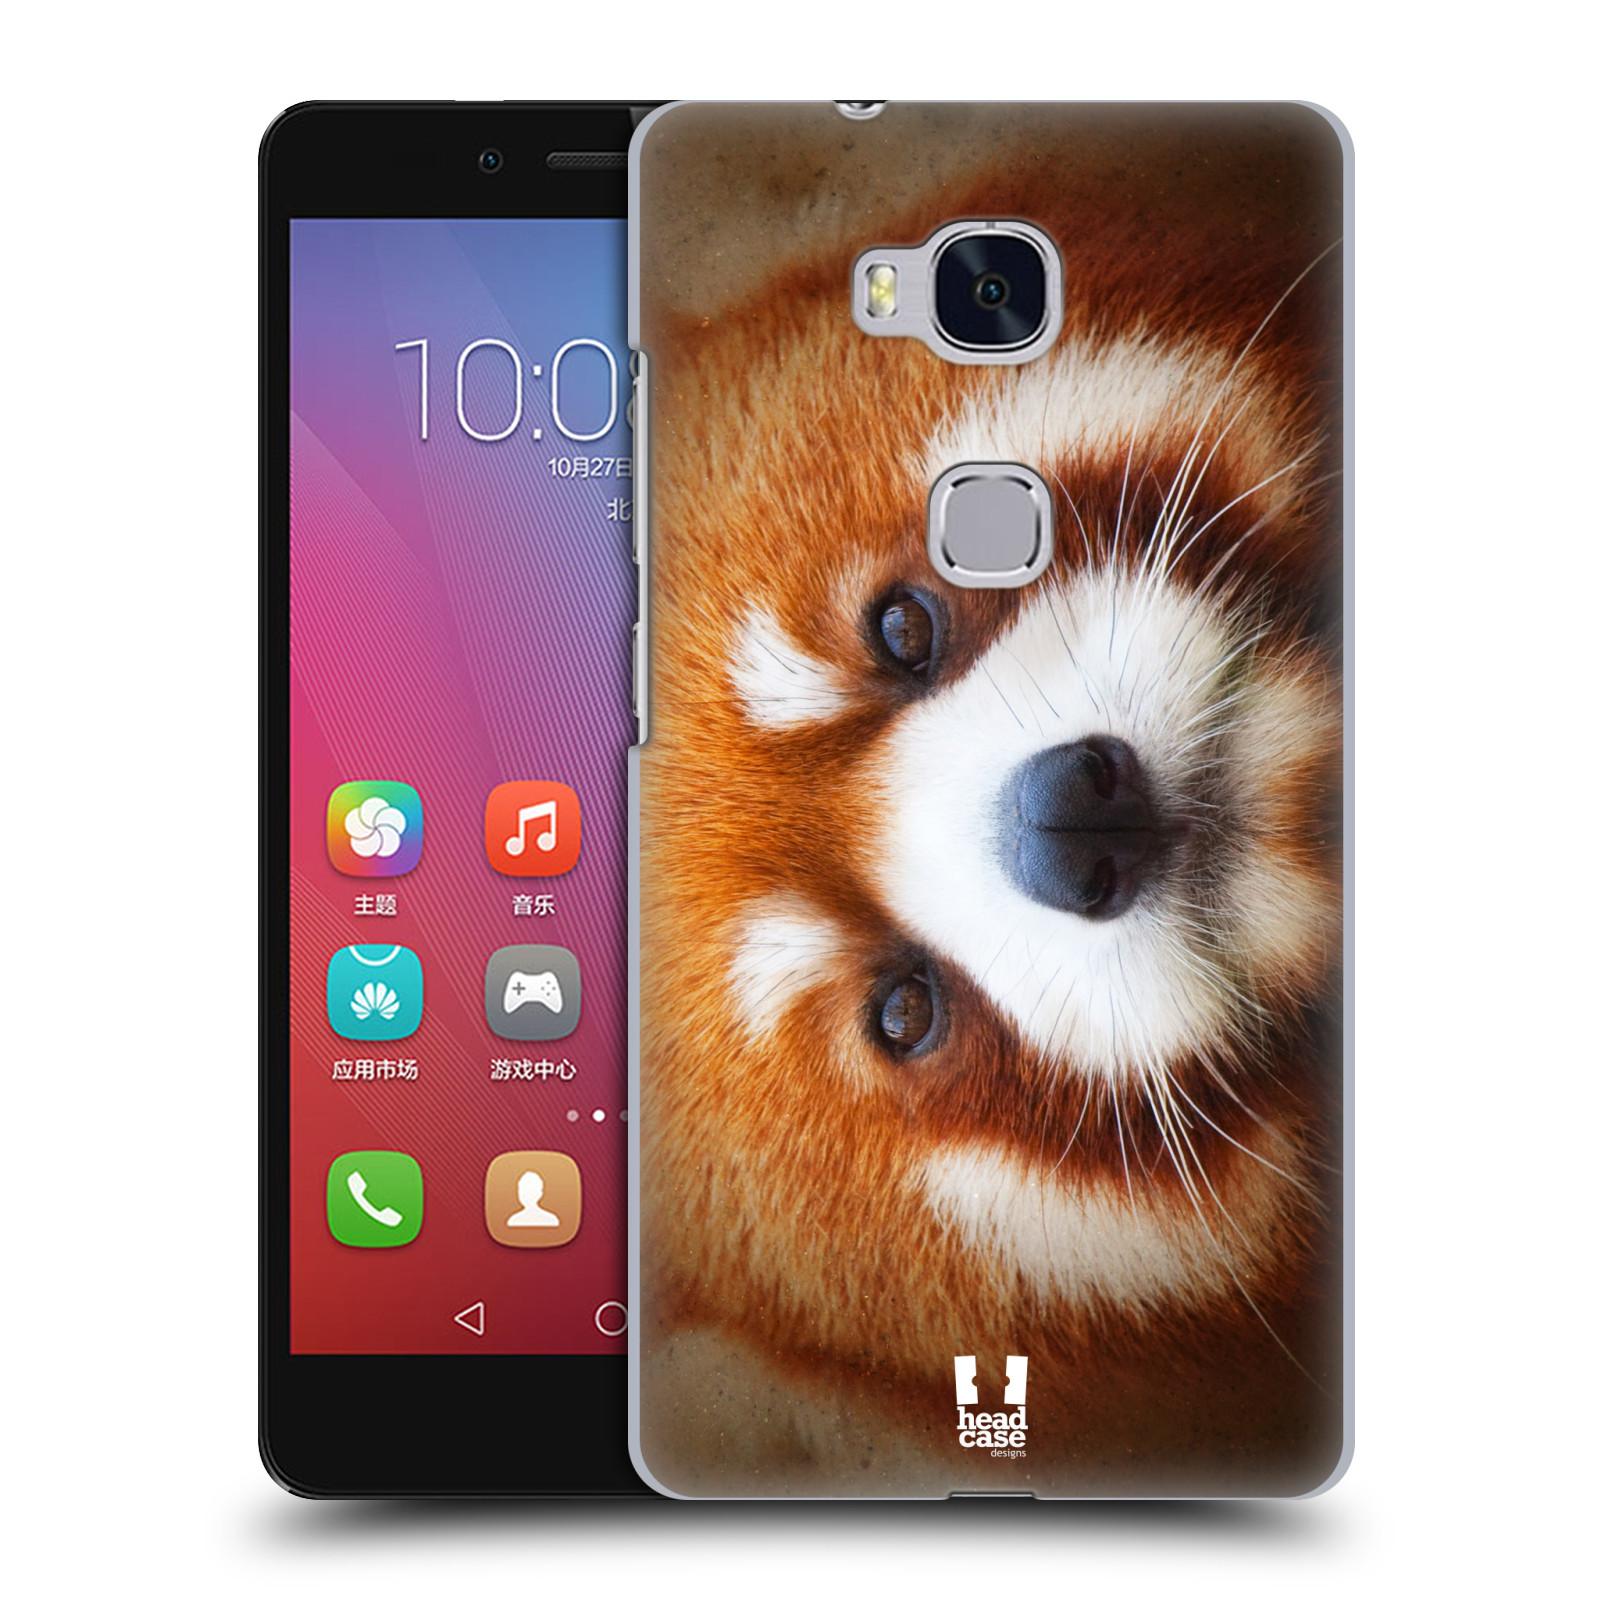 HEAD CASE pevný plastový obal na mobil HUAWEI HONOR 5X vzor Zvířecí tváře 2 medvěd panda rudá